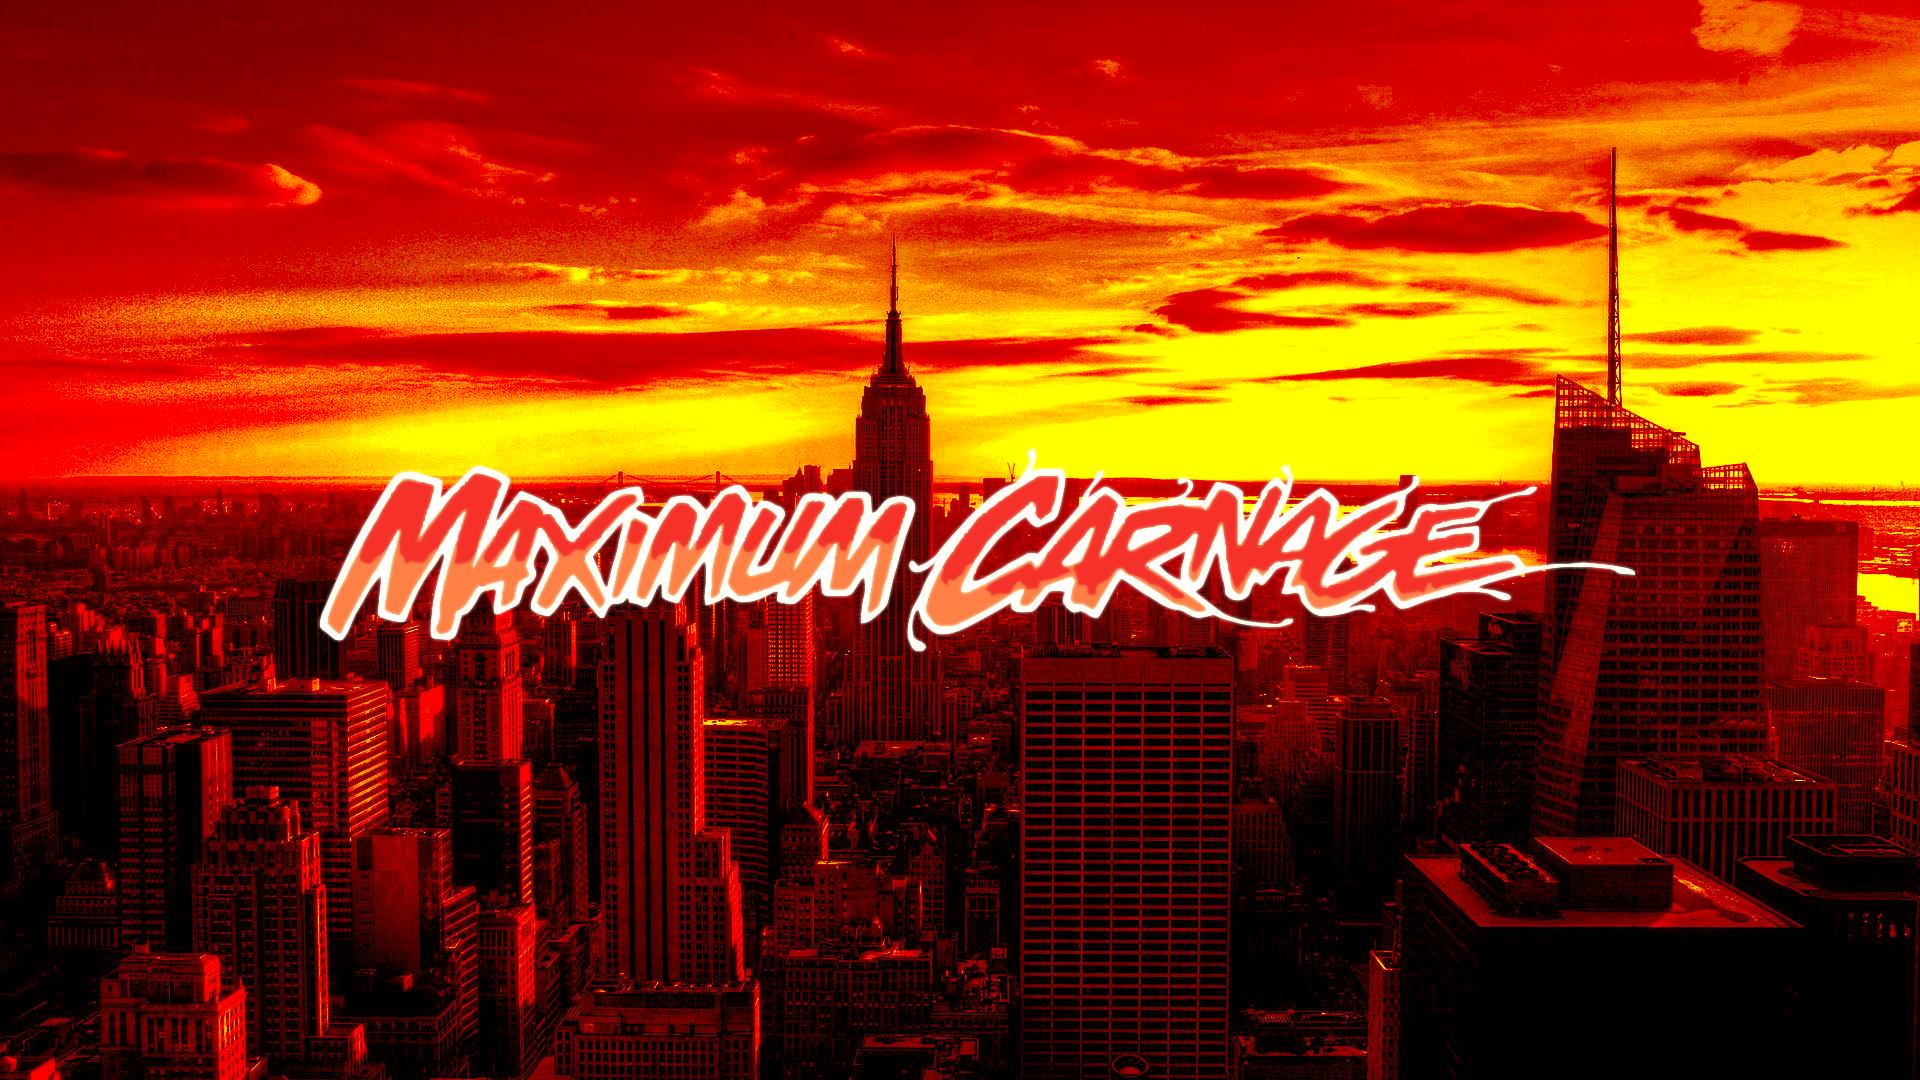 maximum carnage wallpaper - photo #7